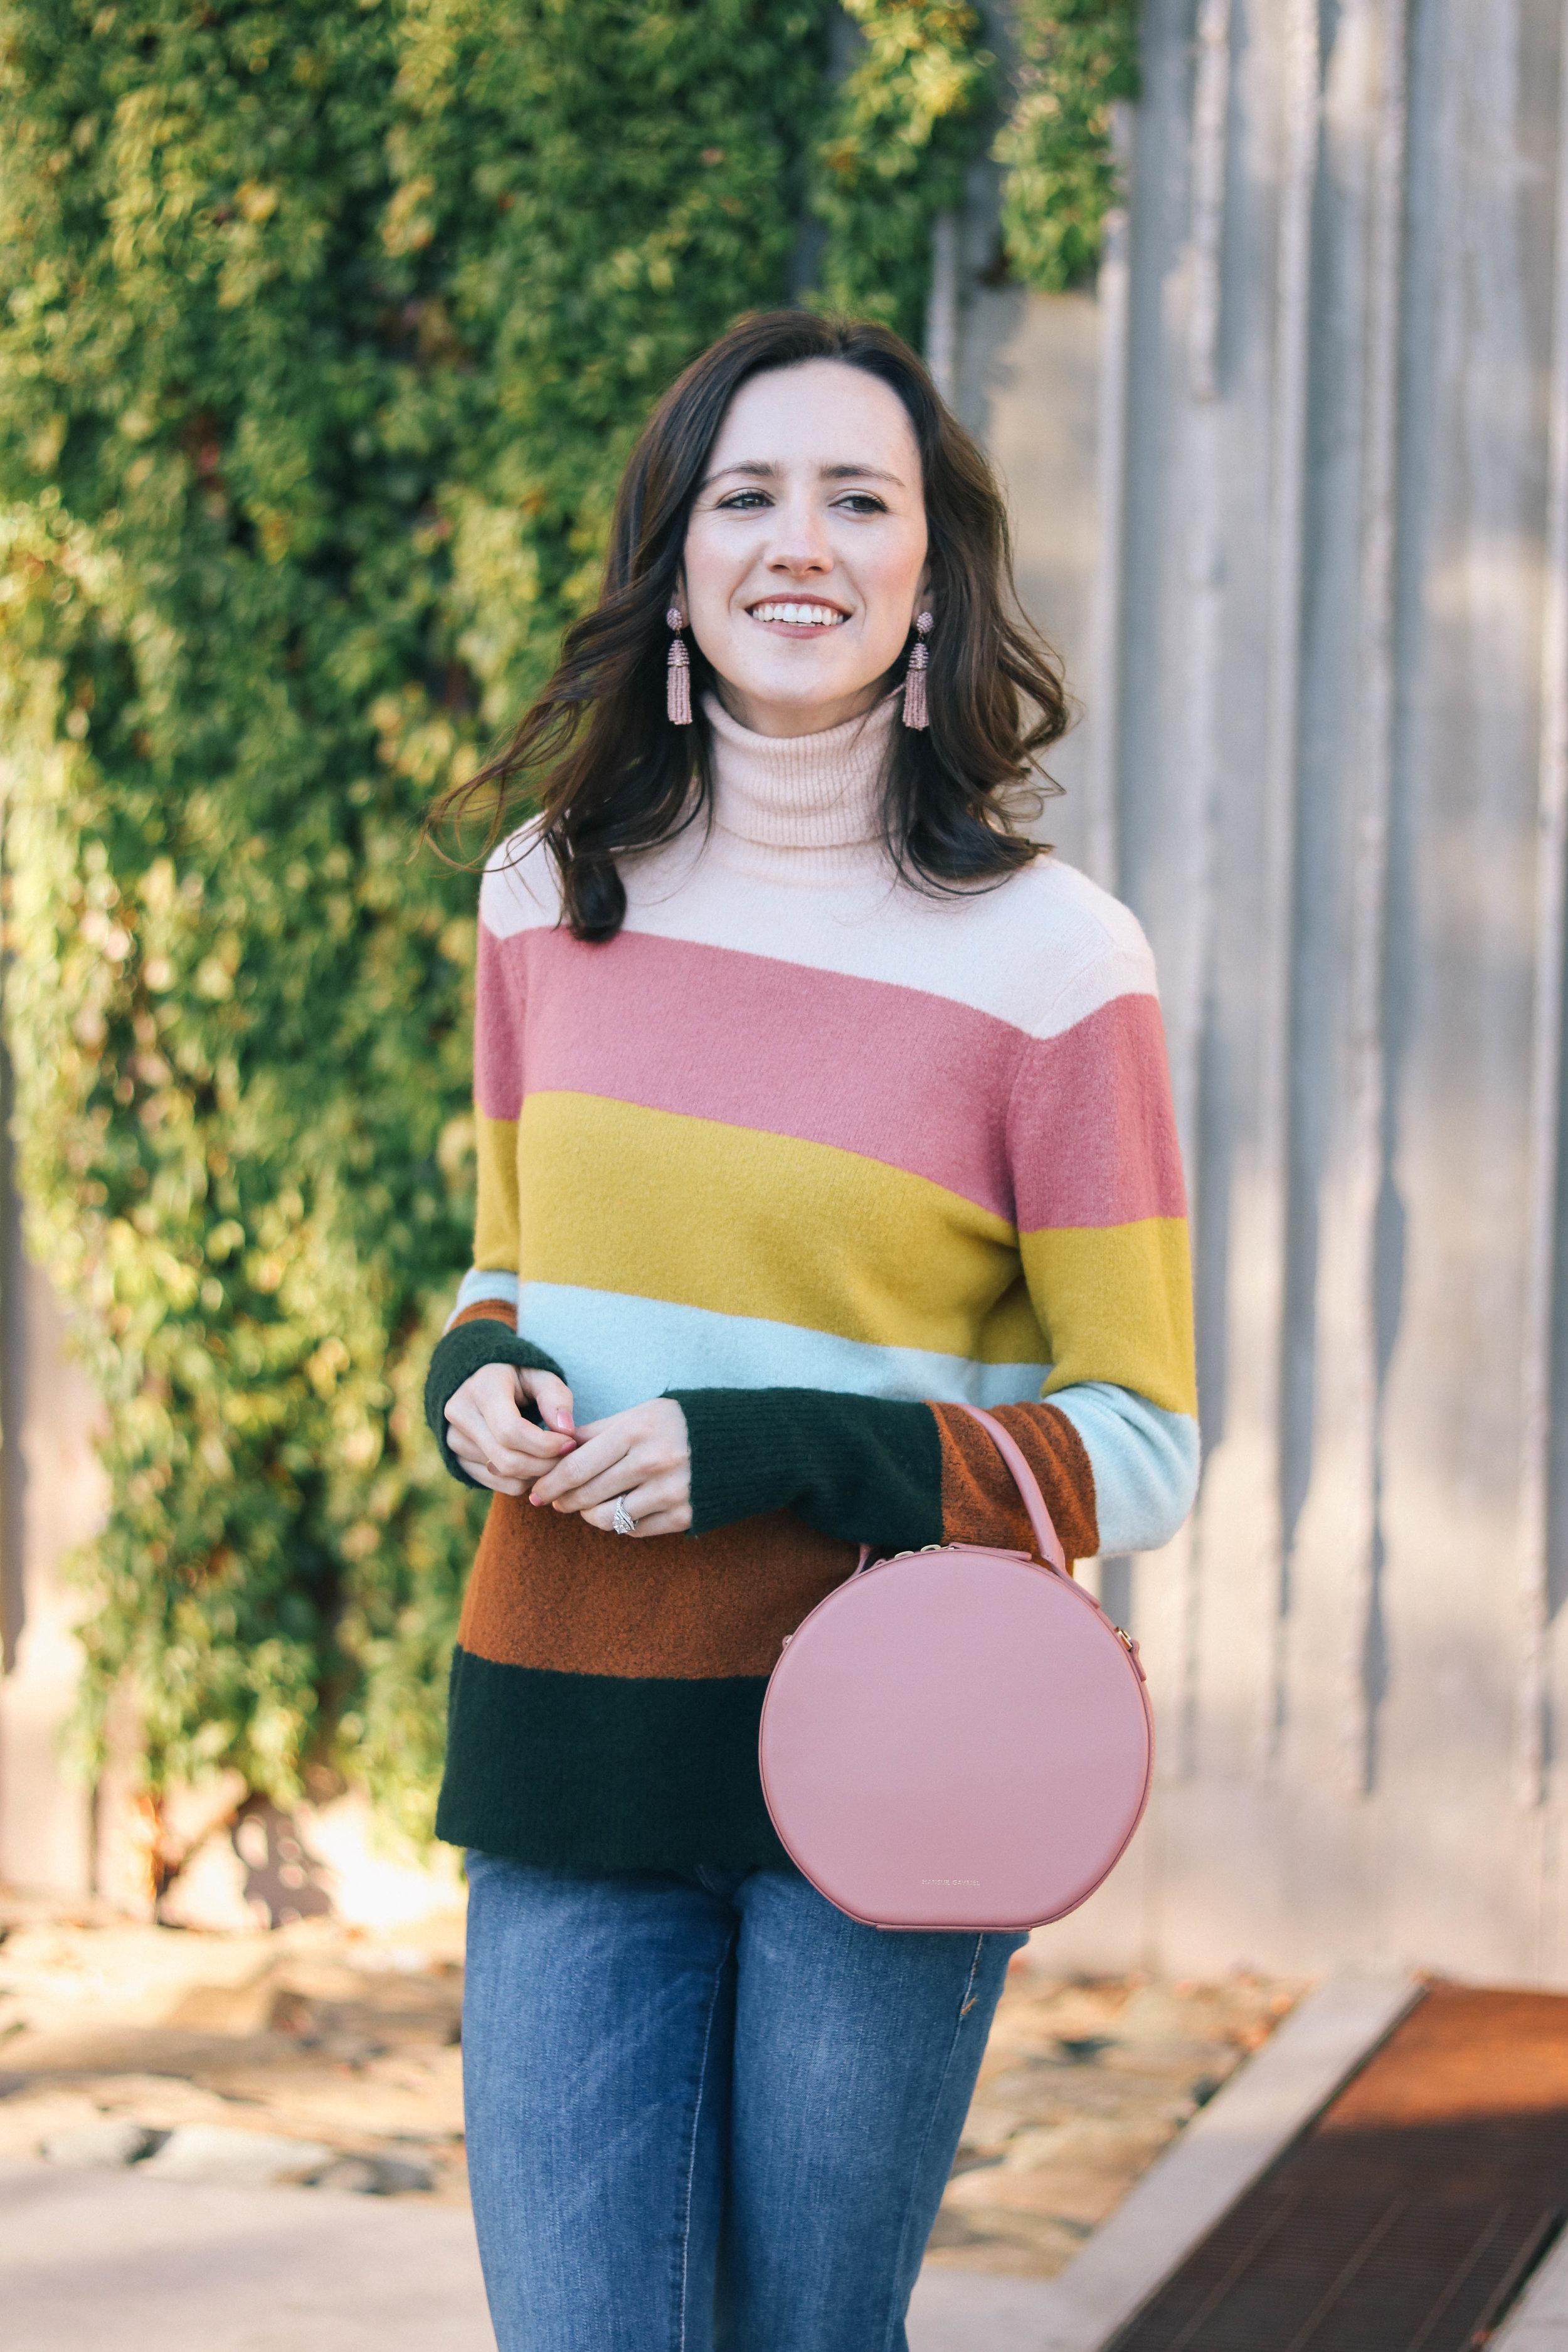 bb-striped-sweater-010 (1 of 1).jpg